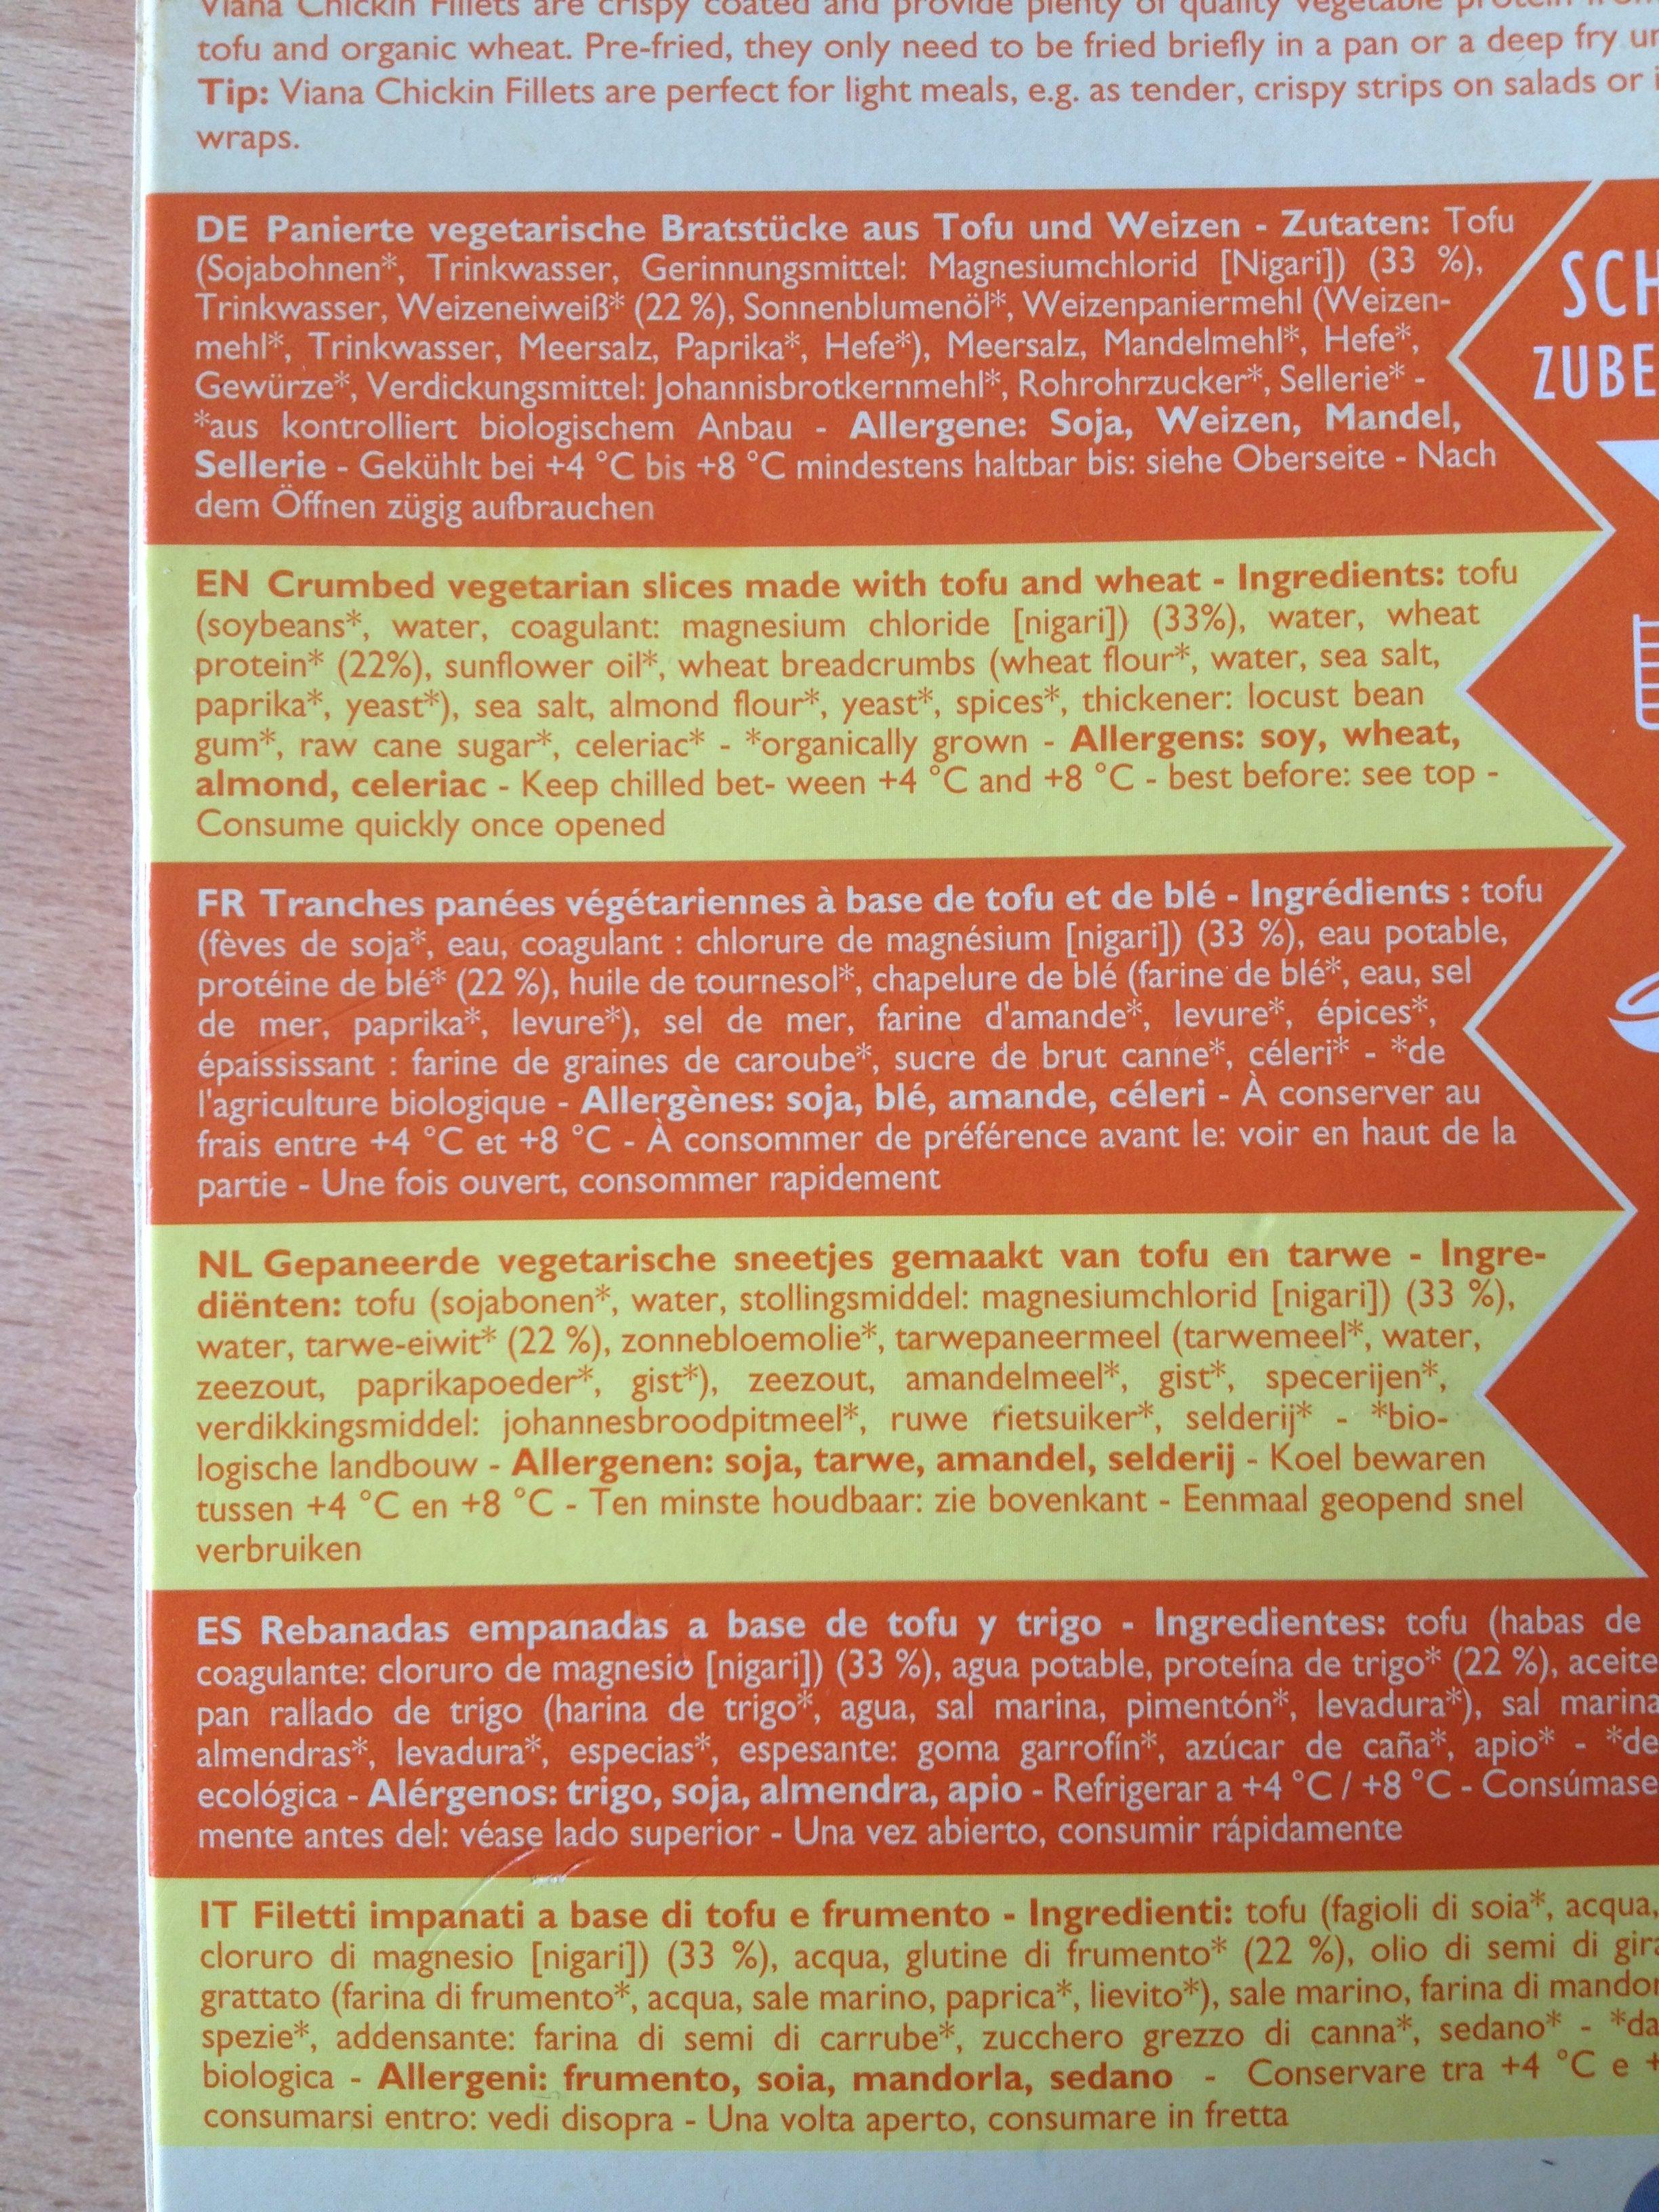 Chikin Fillets (100% vegetal) - Ingredients